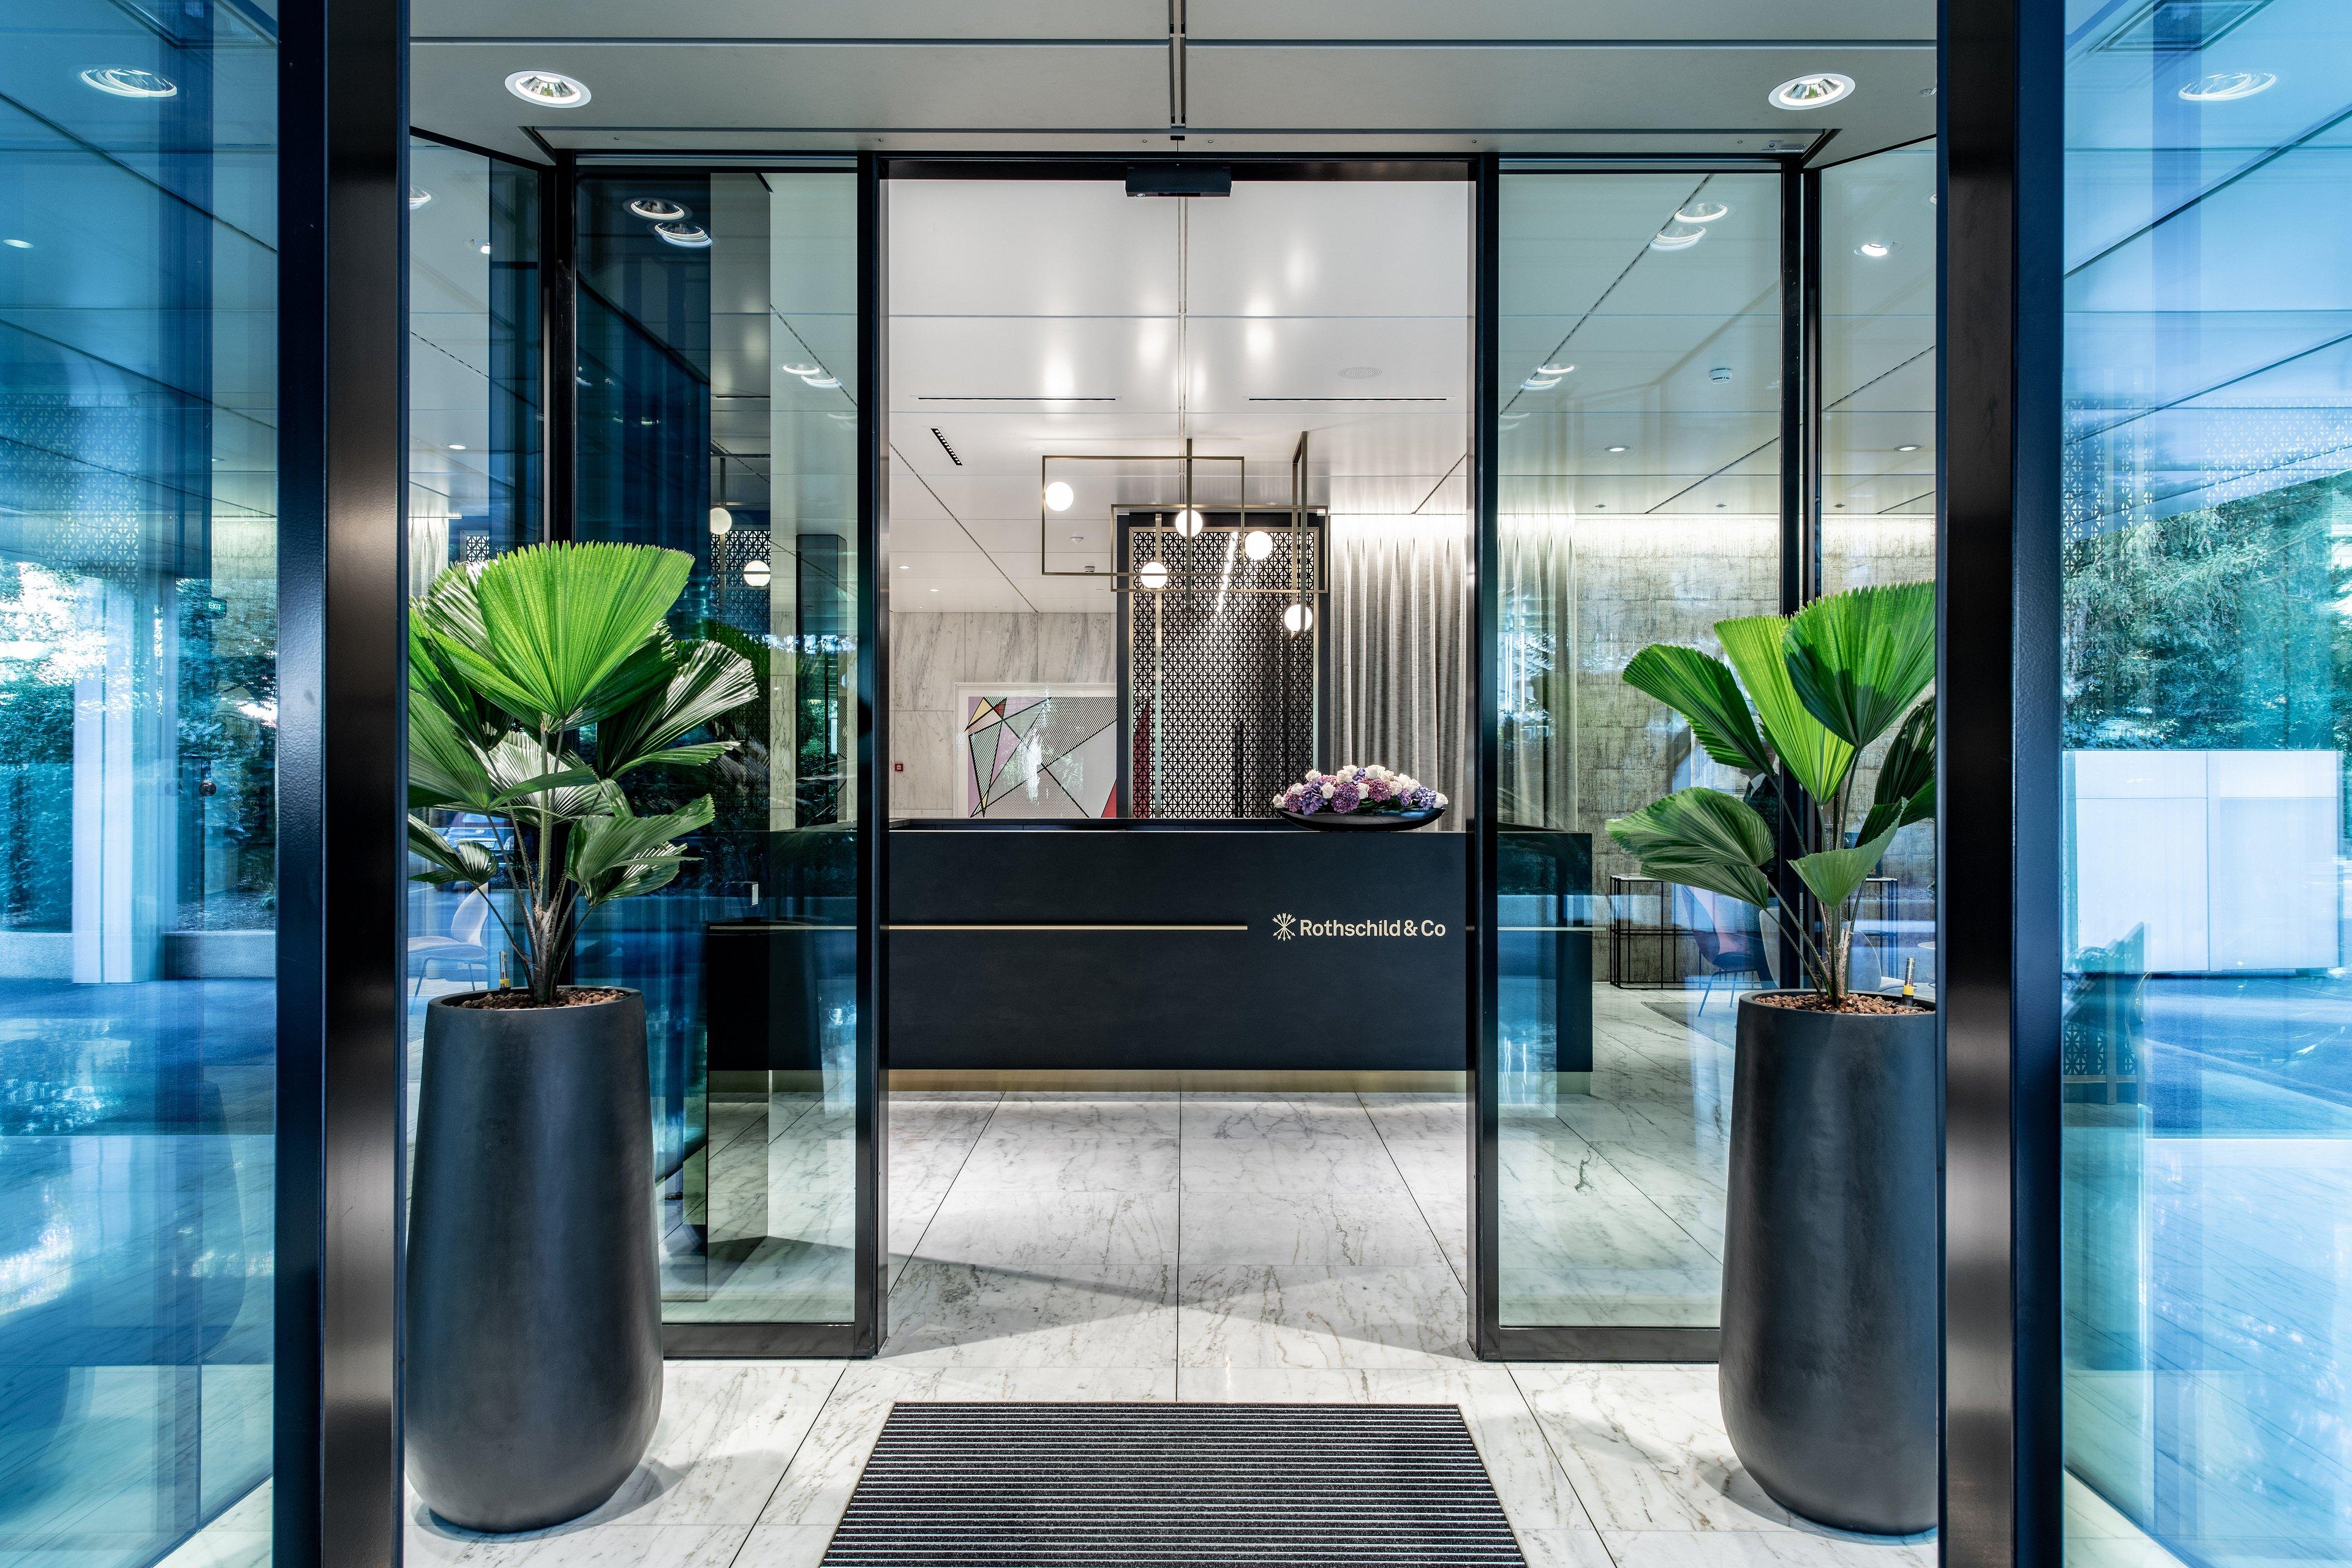 Rothschild & Co Bank AG